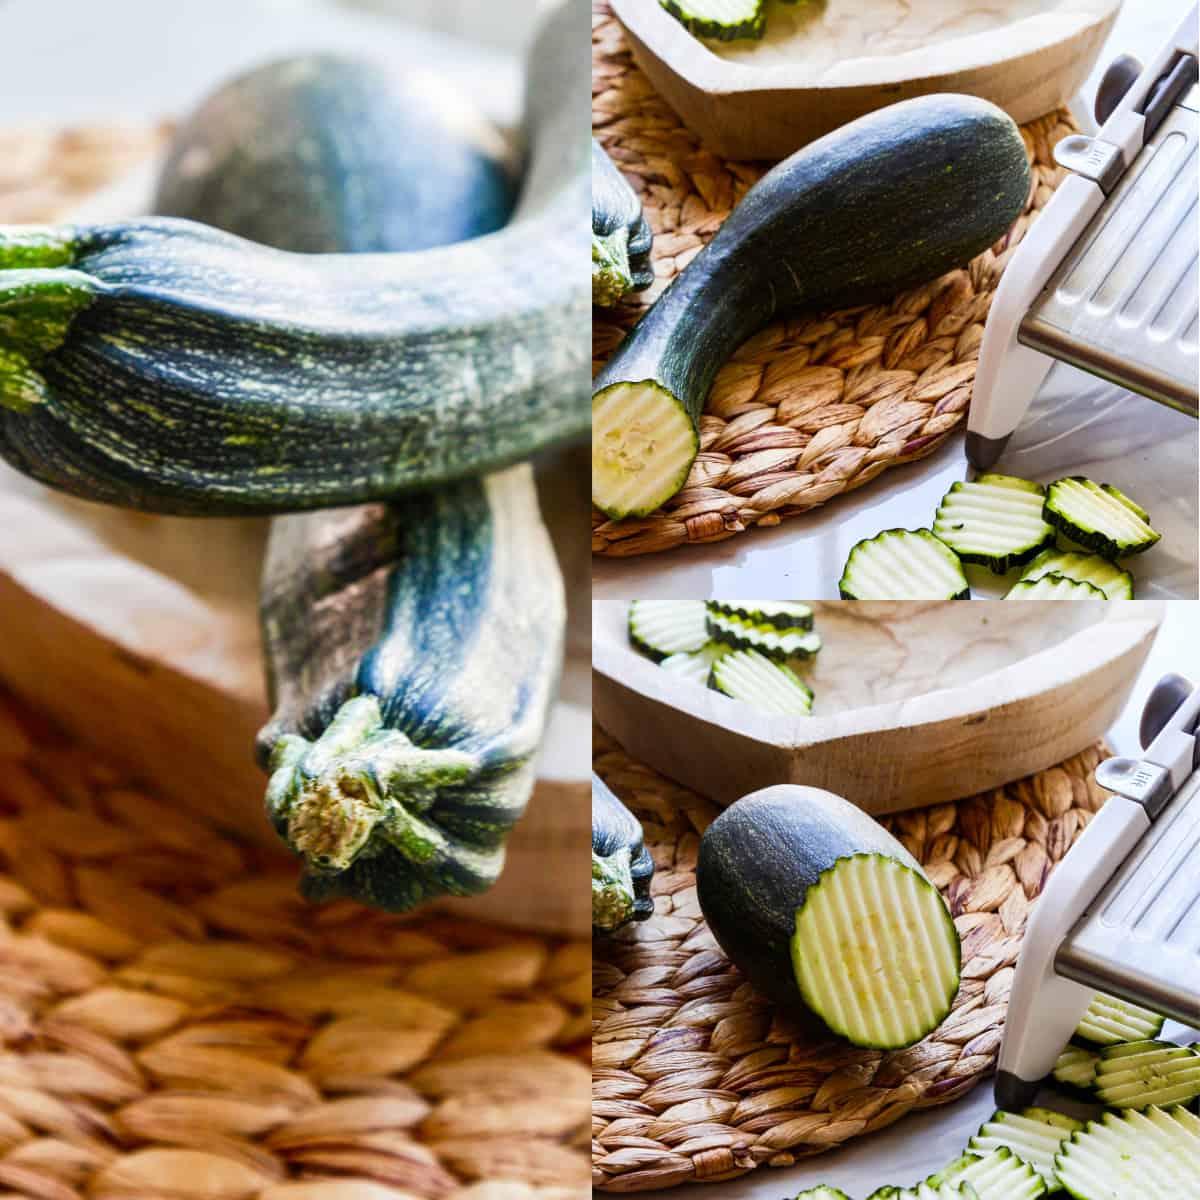 Zucchini in a wood bowl with a mandoline slicing zucchini in a crinkle cut pattern.